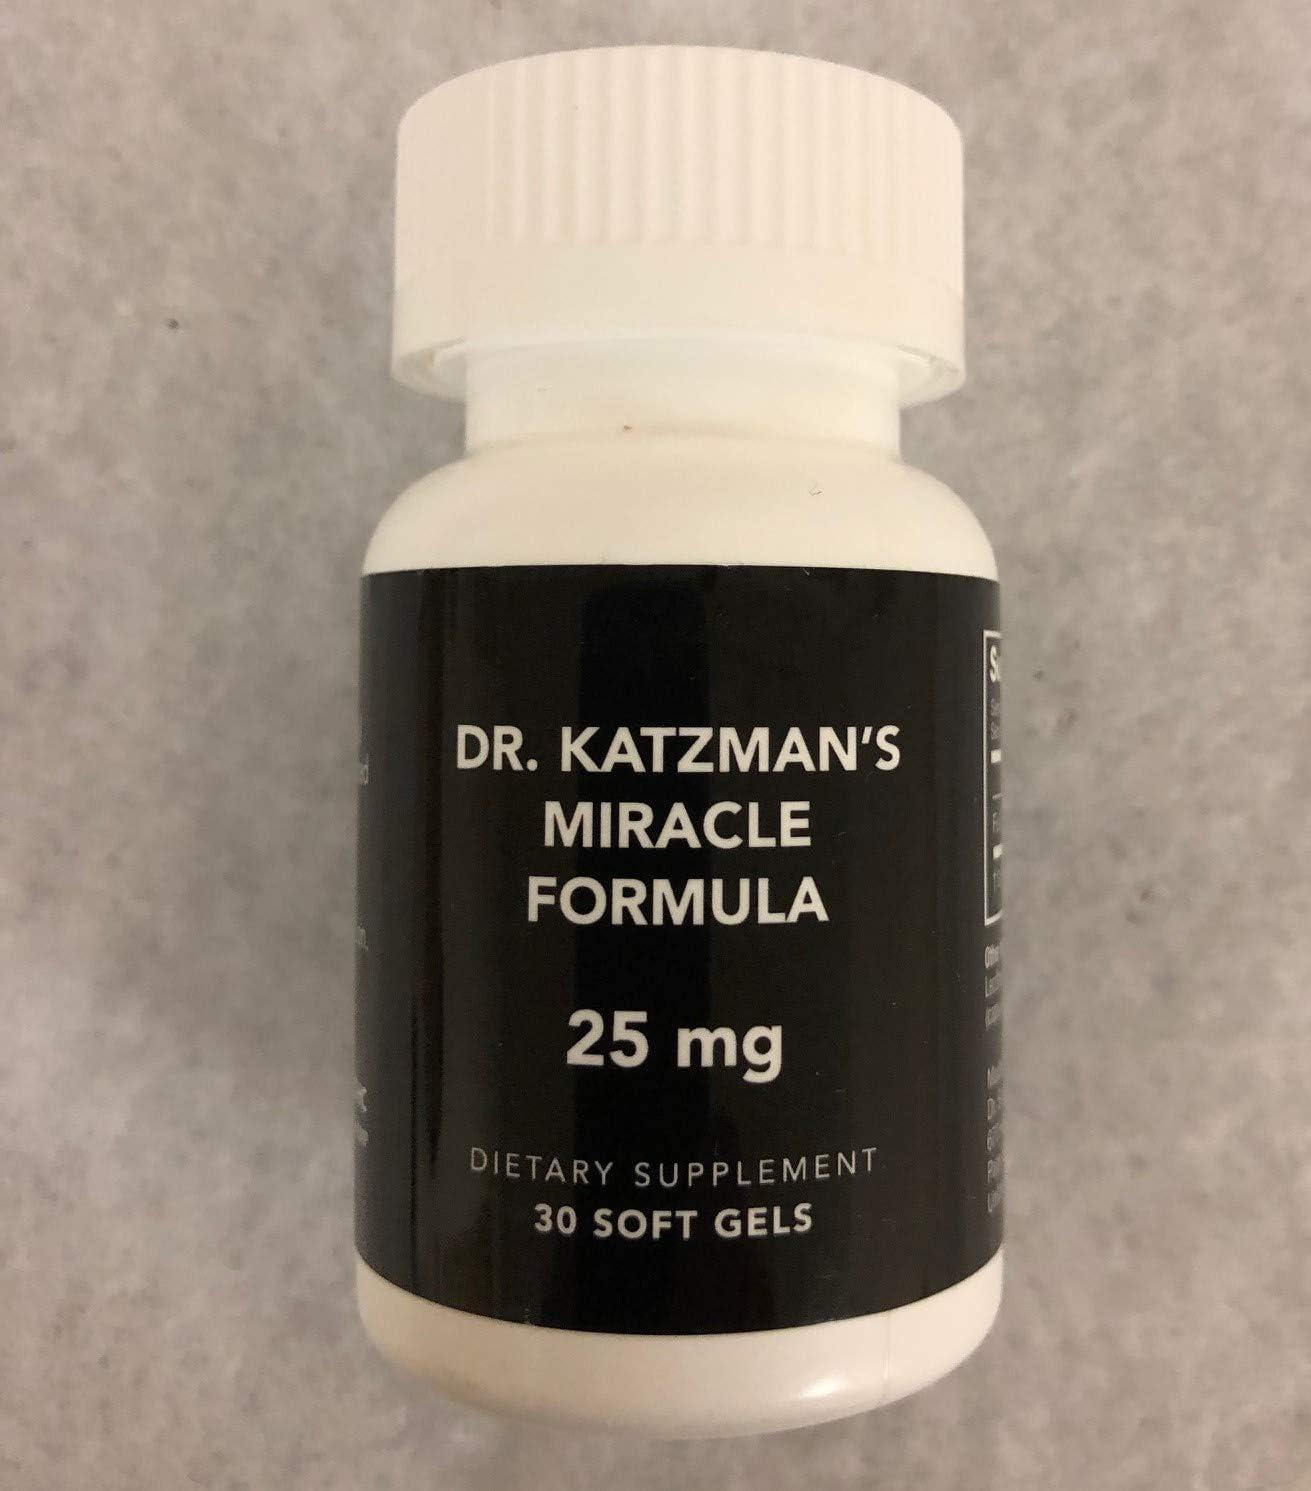 Dr. Katzman's Miracle Formula 25mg Hemp Oil Extract Soft Gels